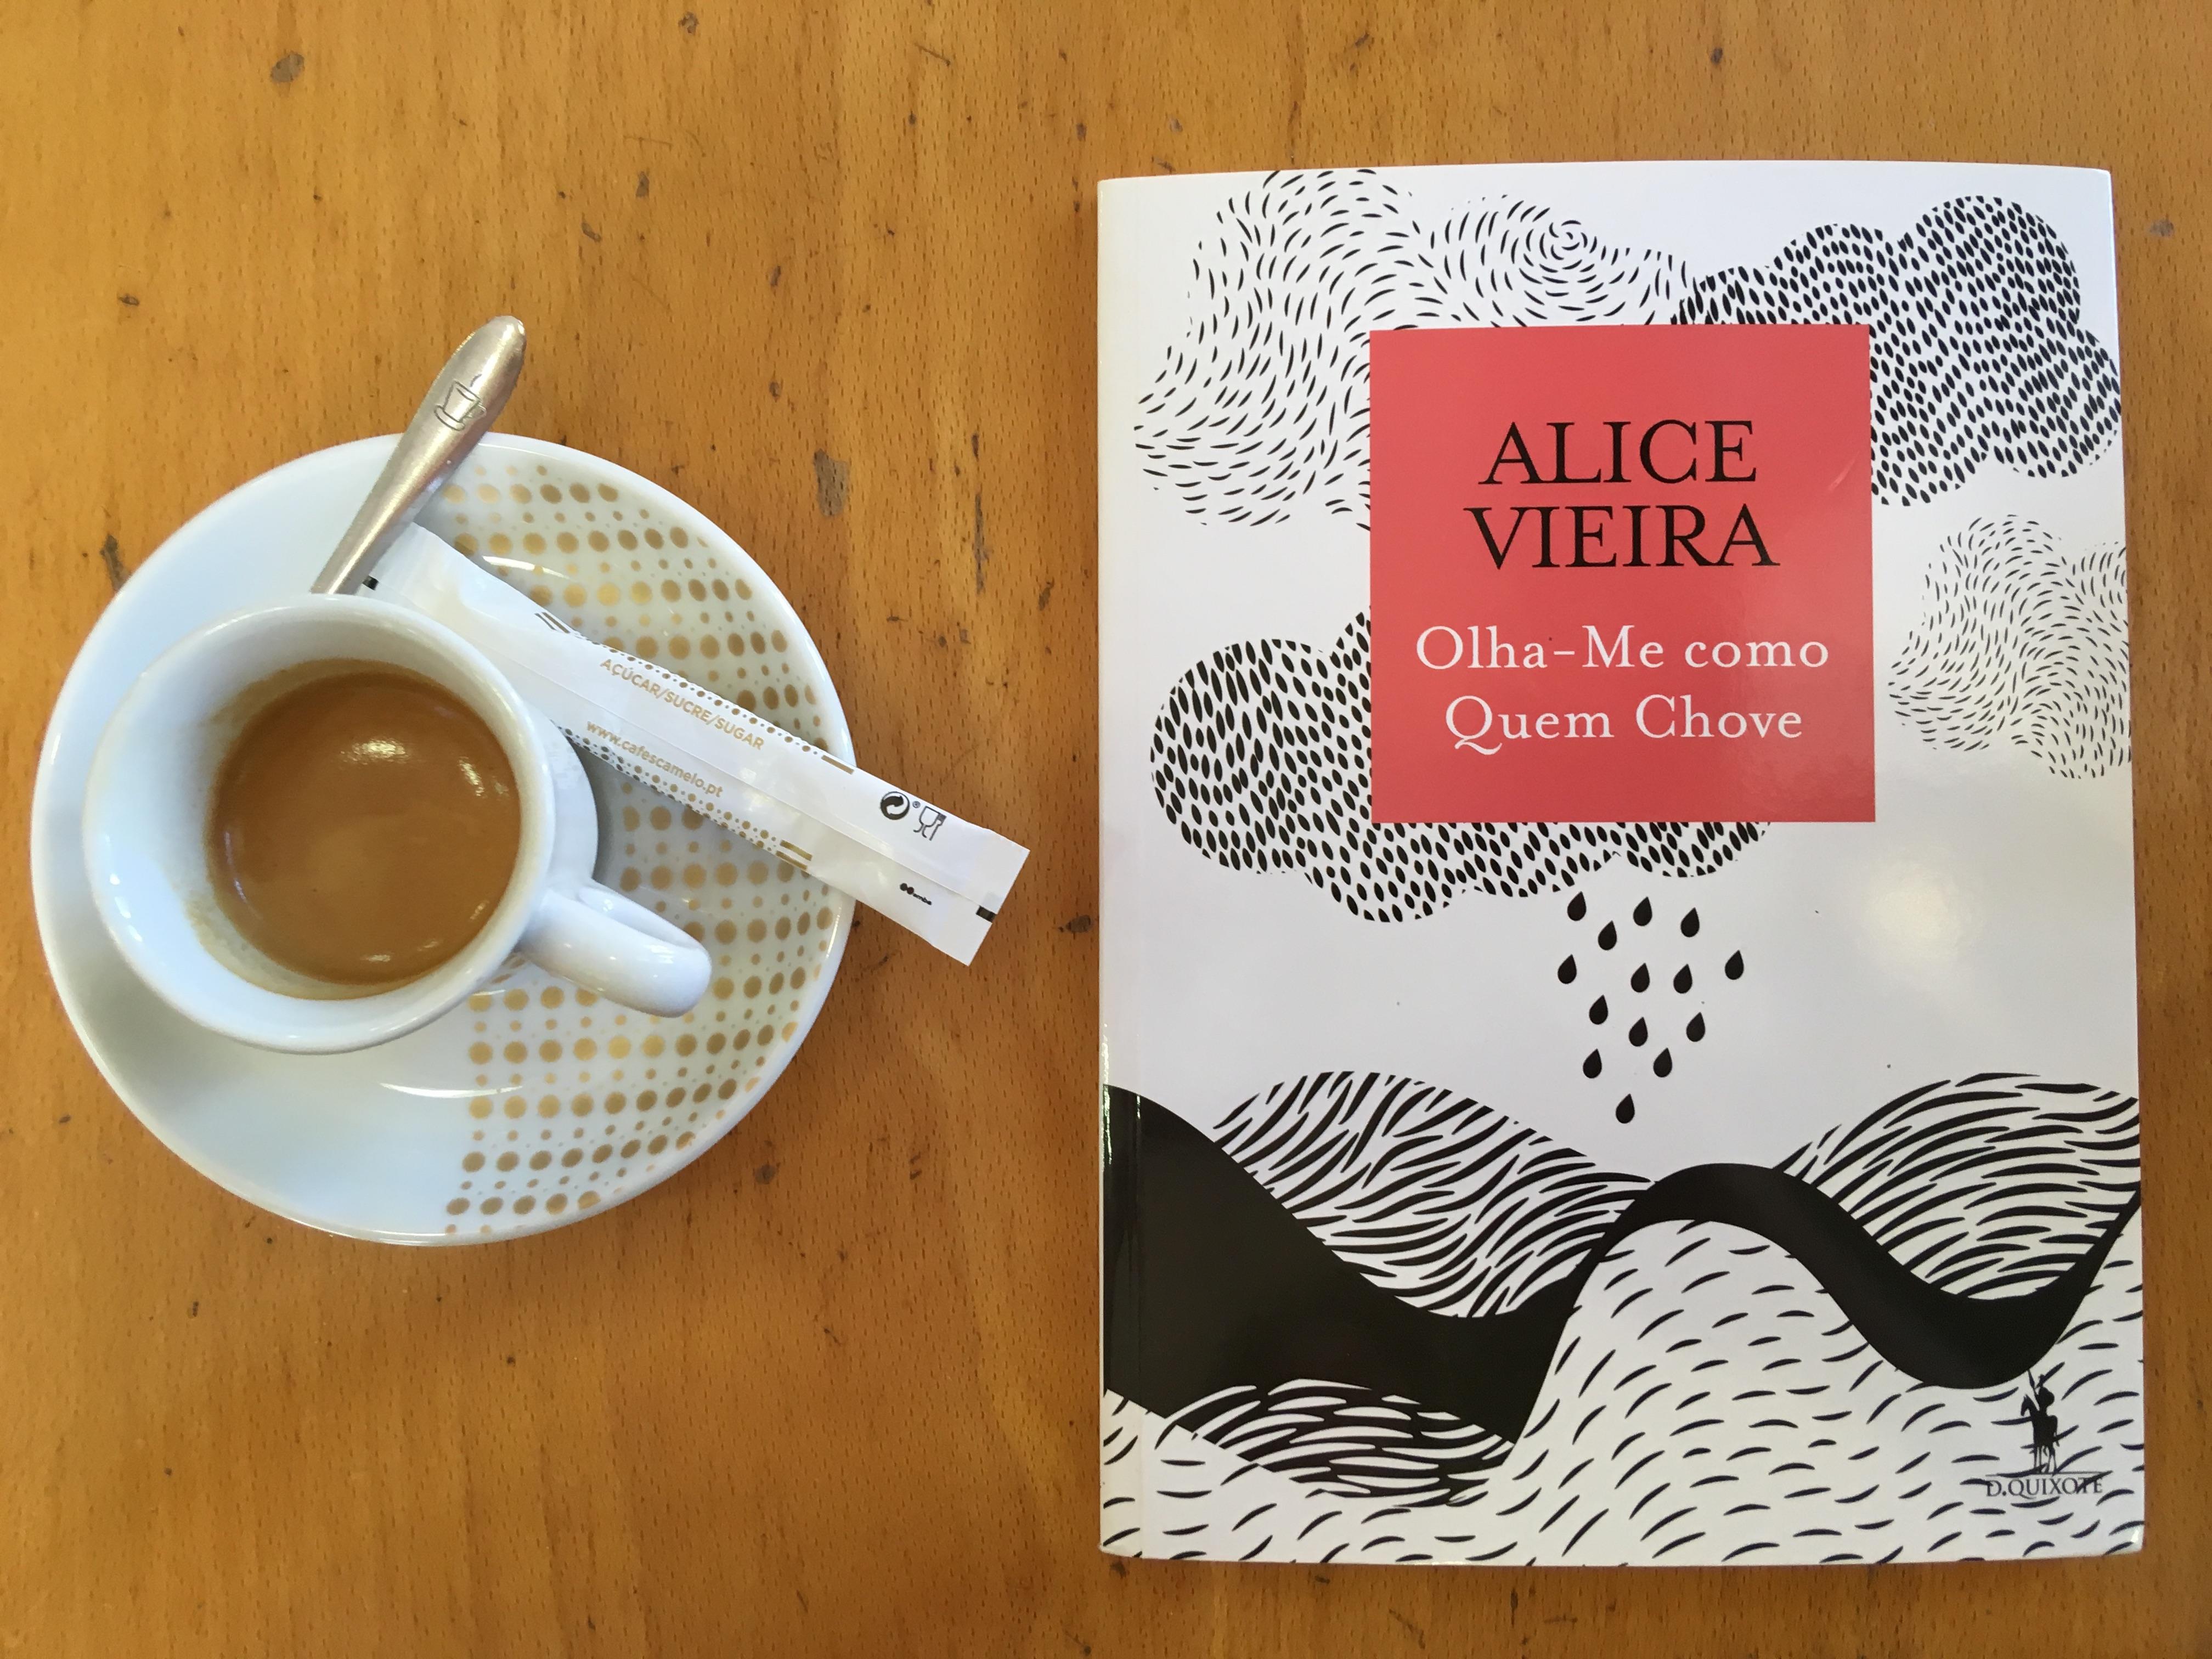 Alice Vieira Wiersze Magellankapl